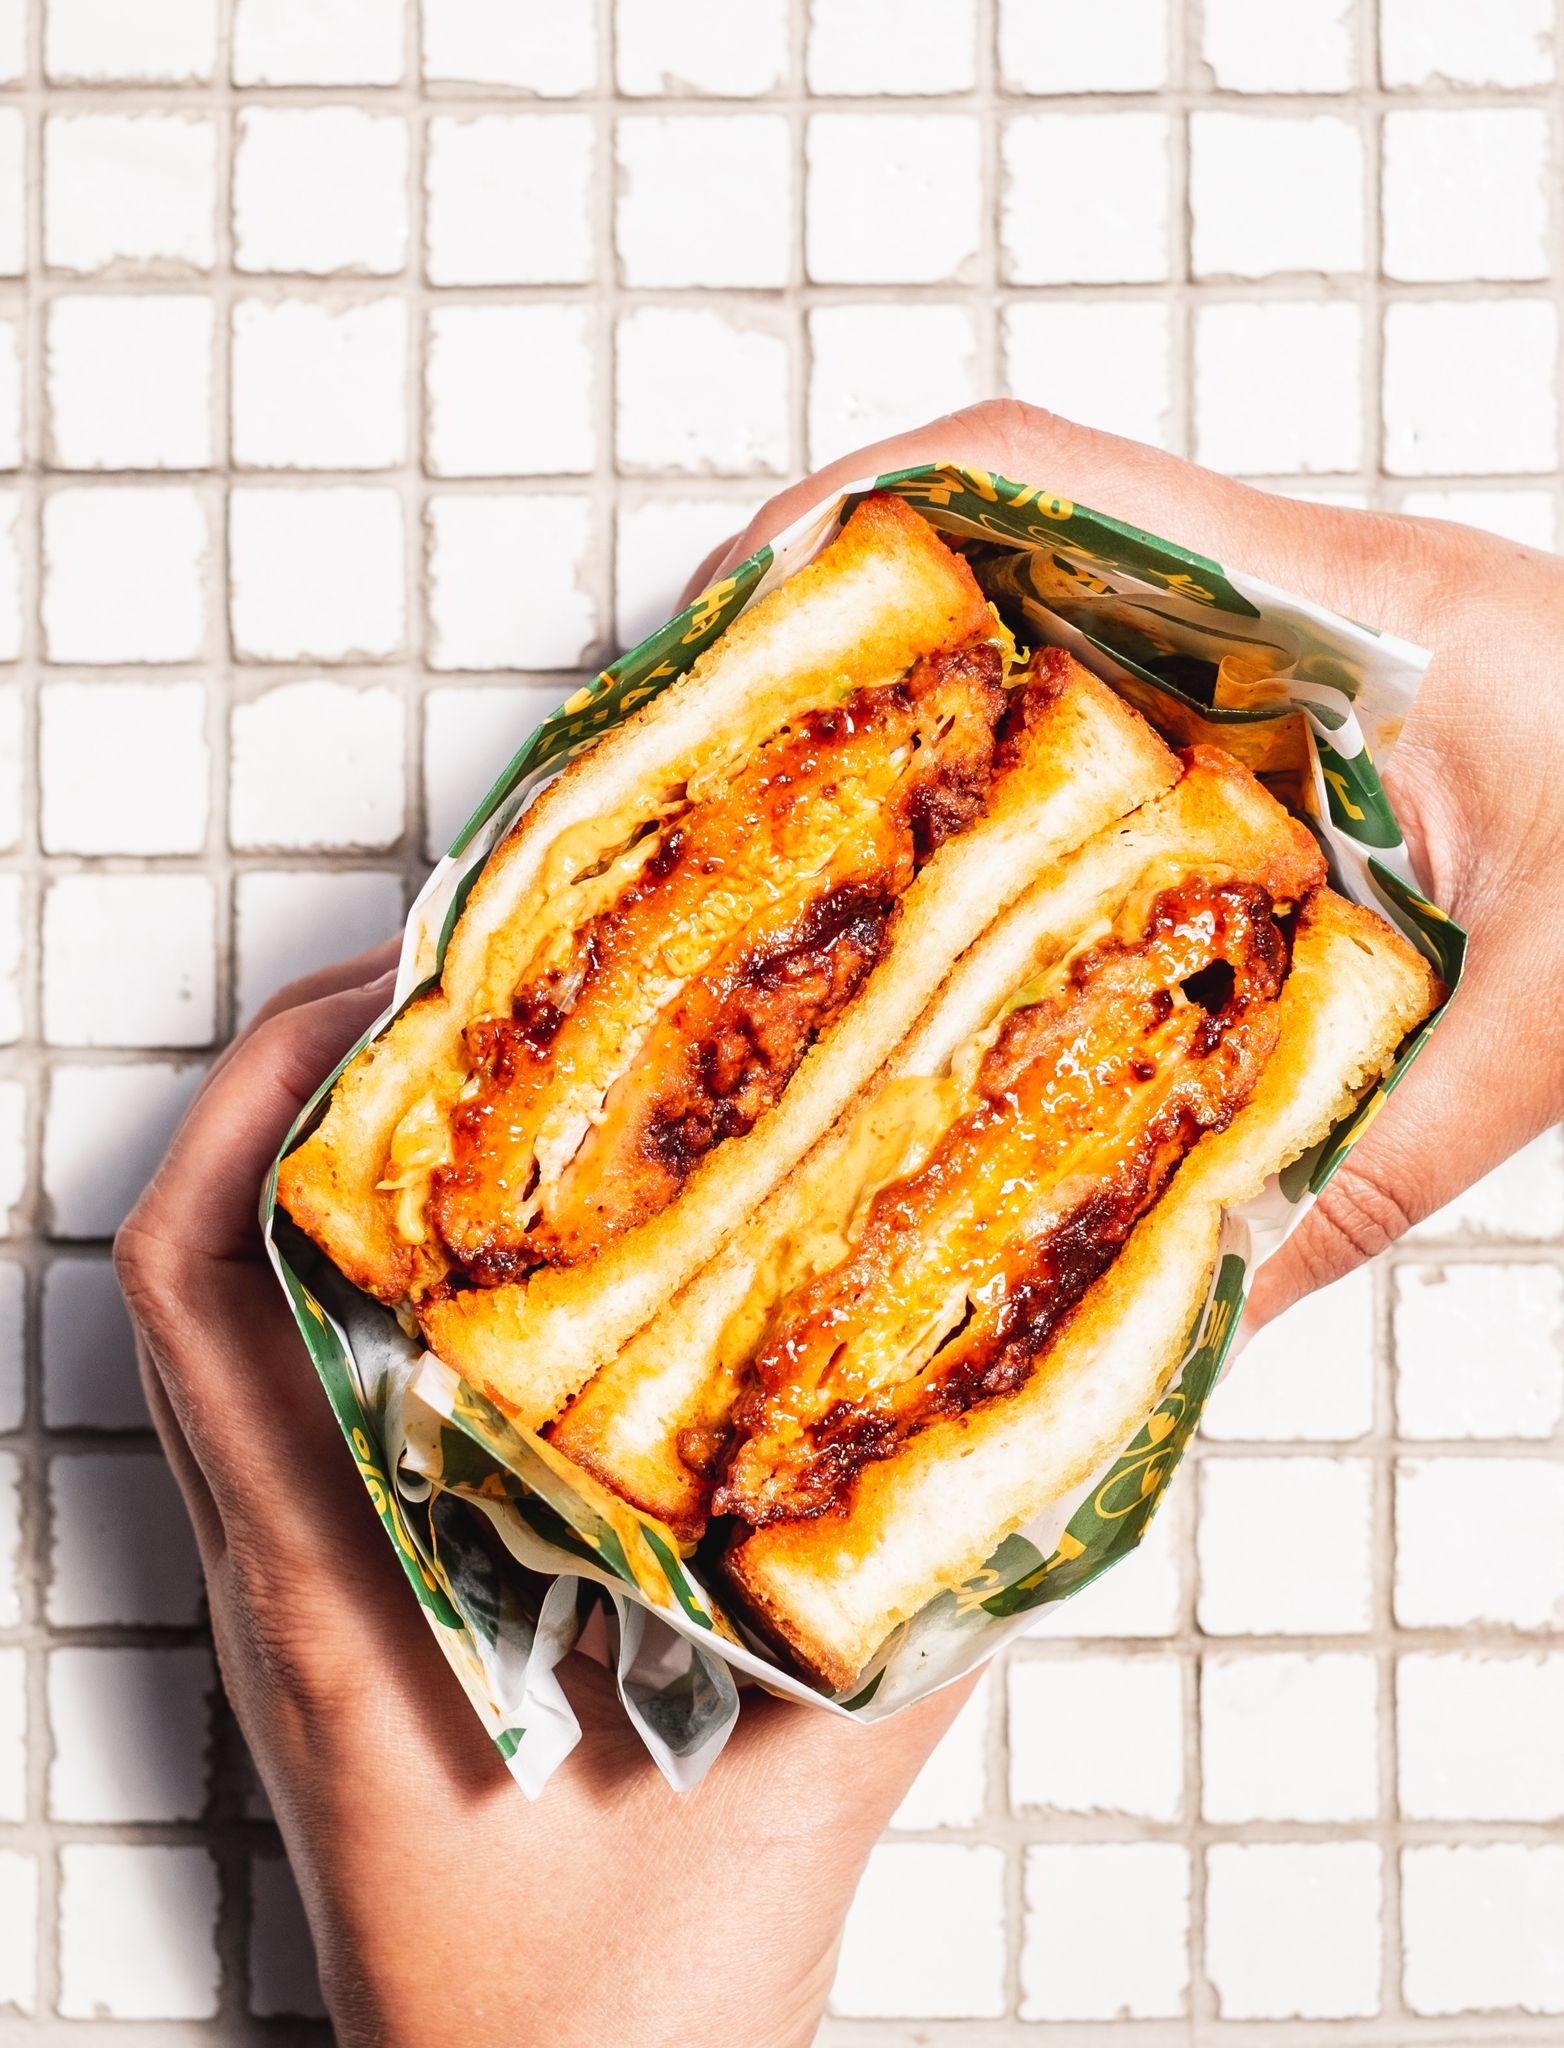 Saucy Sandwich